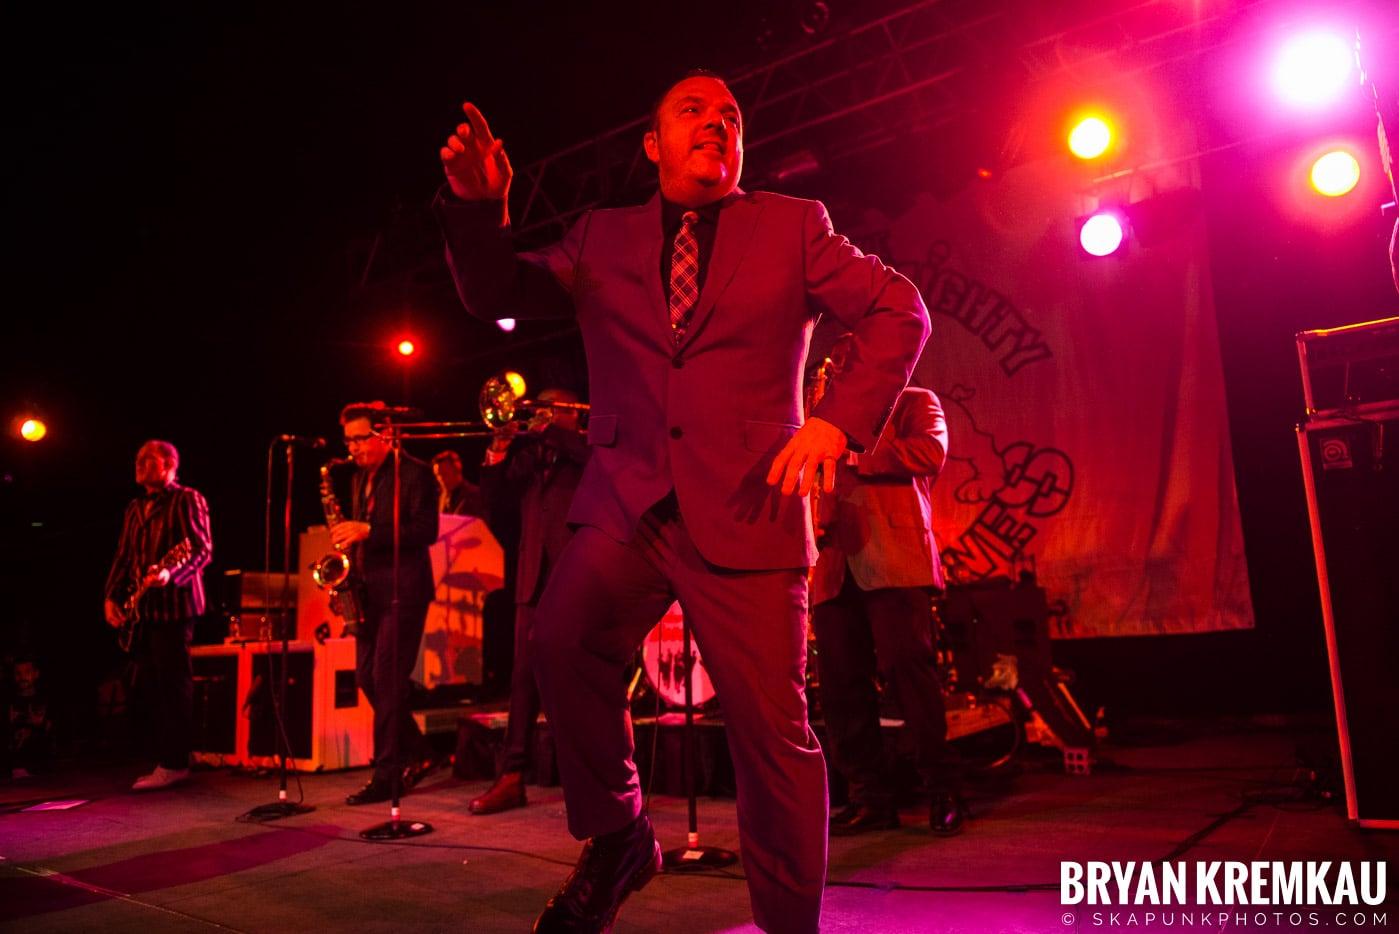 Mighty Mighty Bosstones @ Starland Ballroom, Sayreville, NJ - 7.29.17 (28)